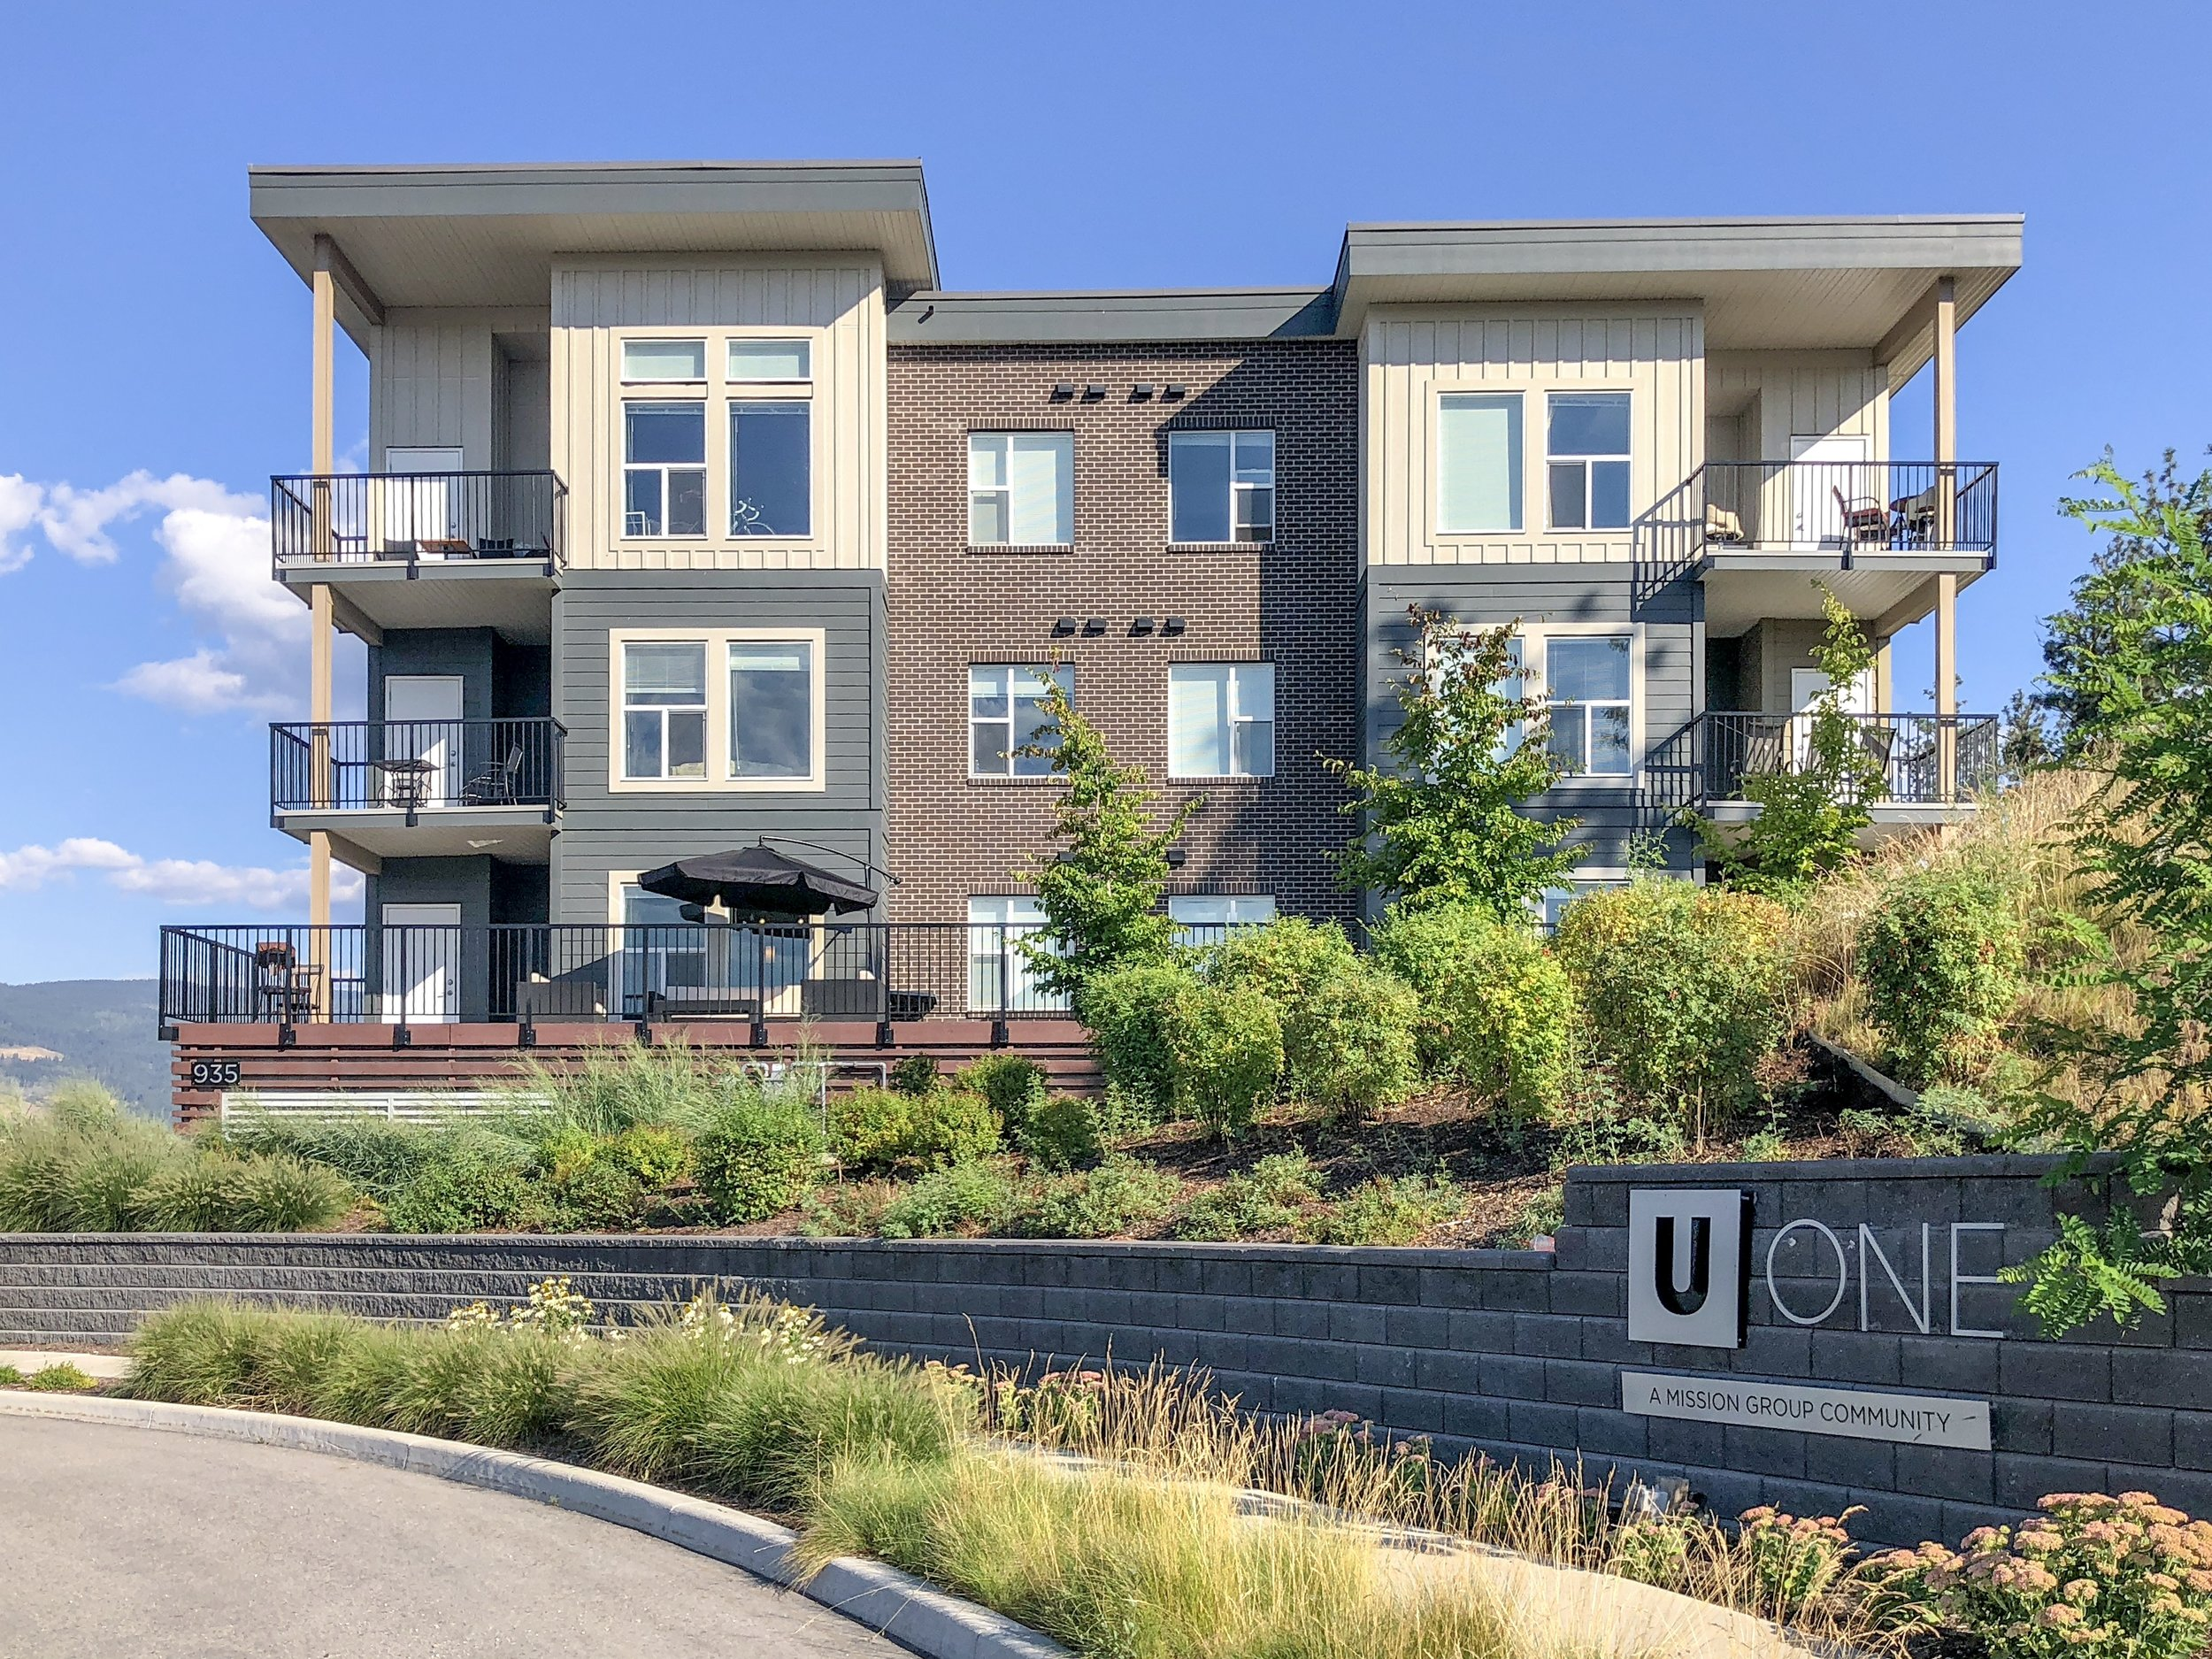 u-one-ubco-01-kelowna-property-investment.jpg